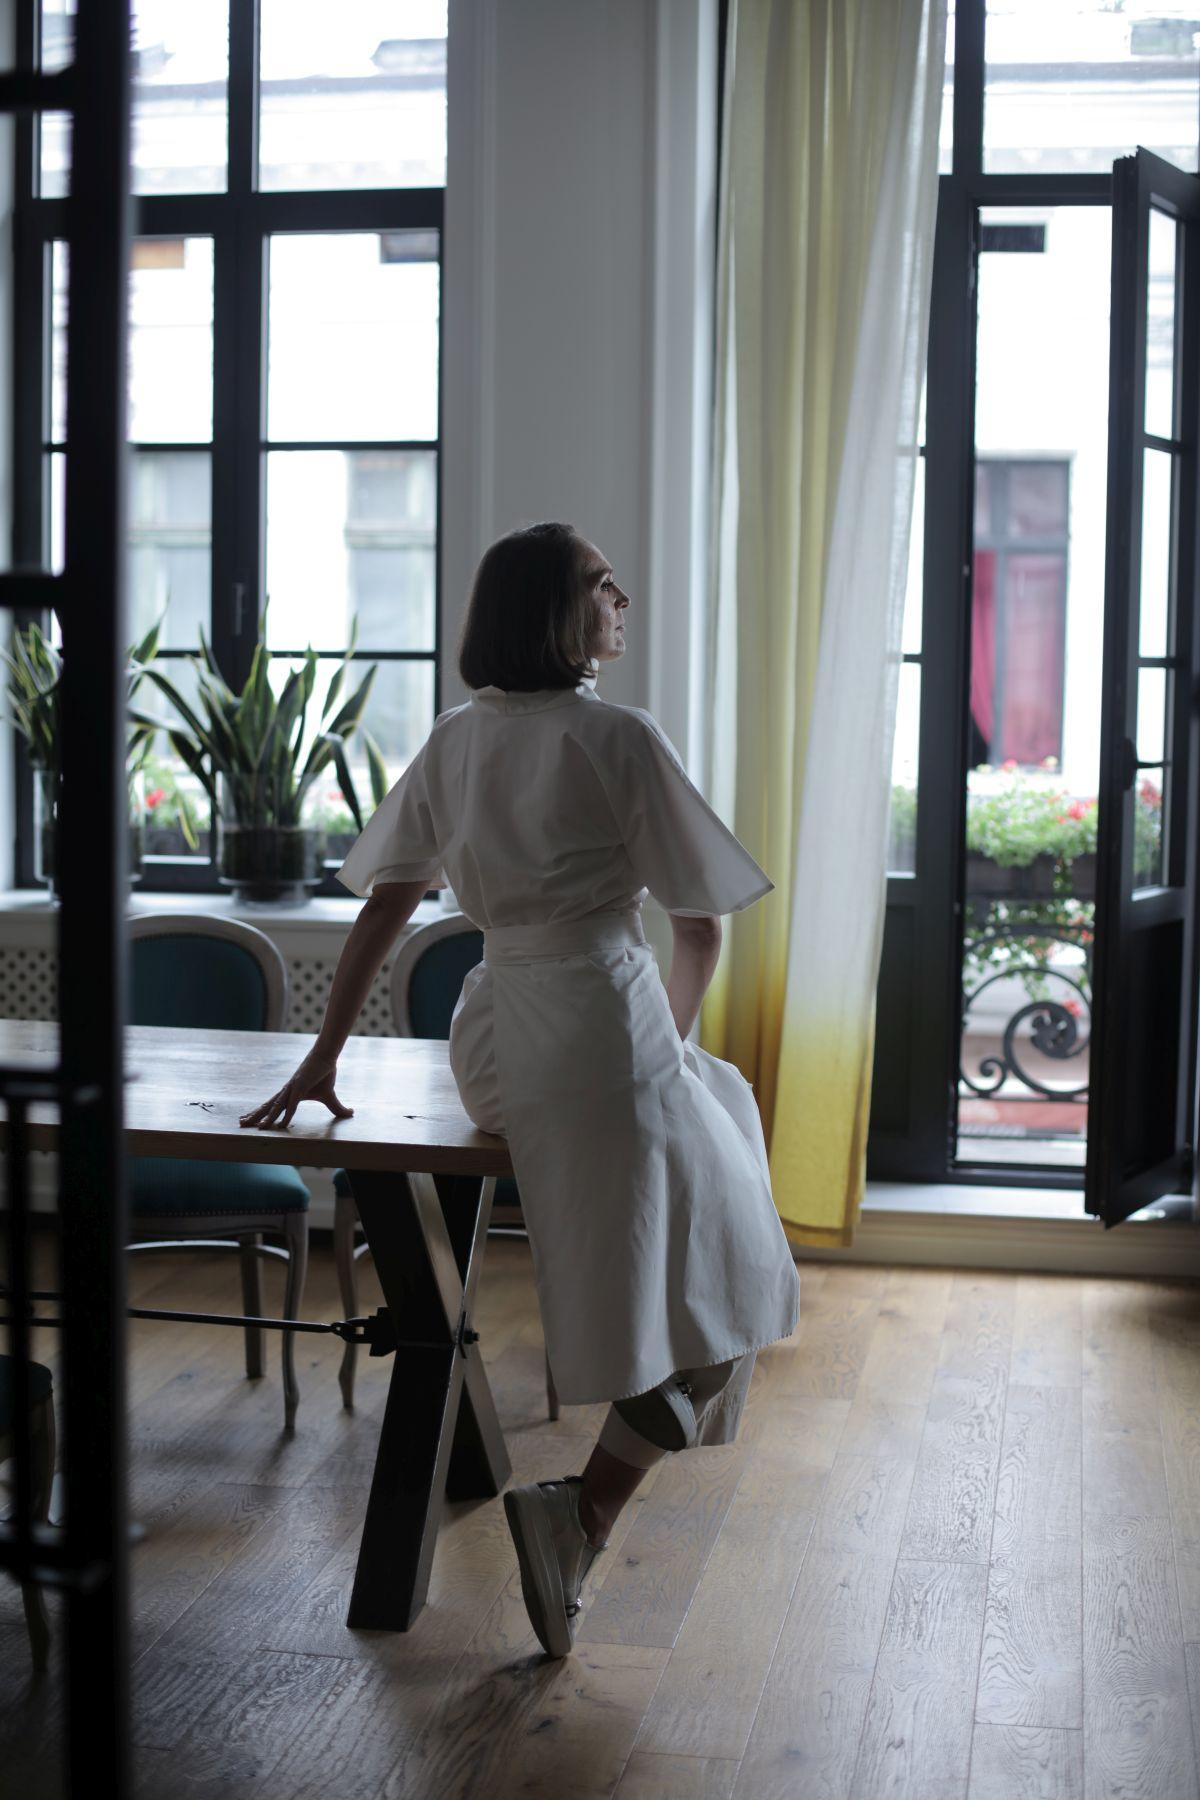 adelaparvu.com despre transformari personale, Foto Adi Stoicoviciu (4)